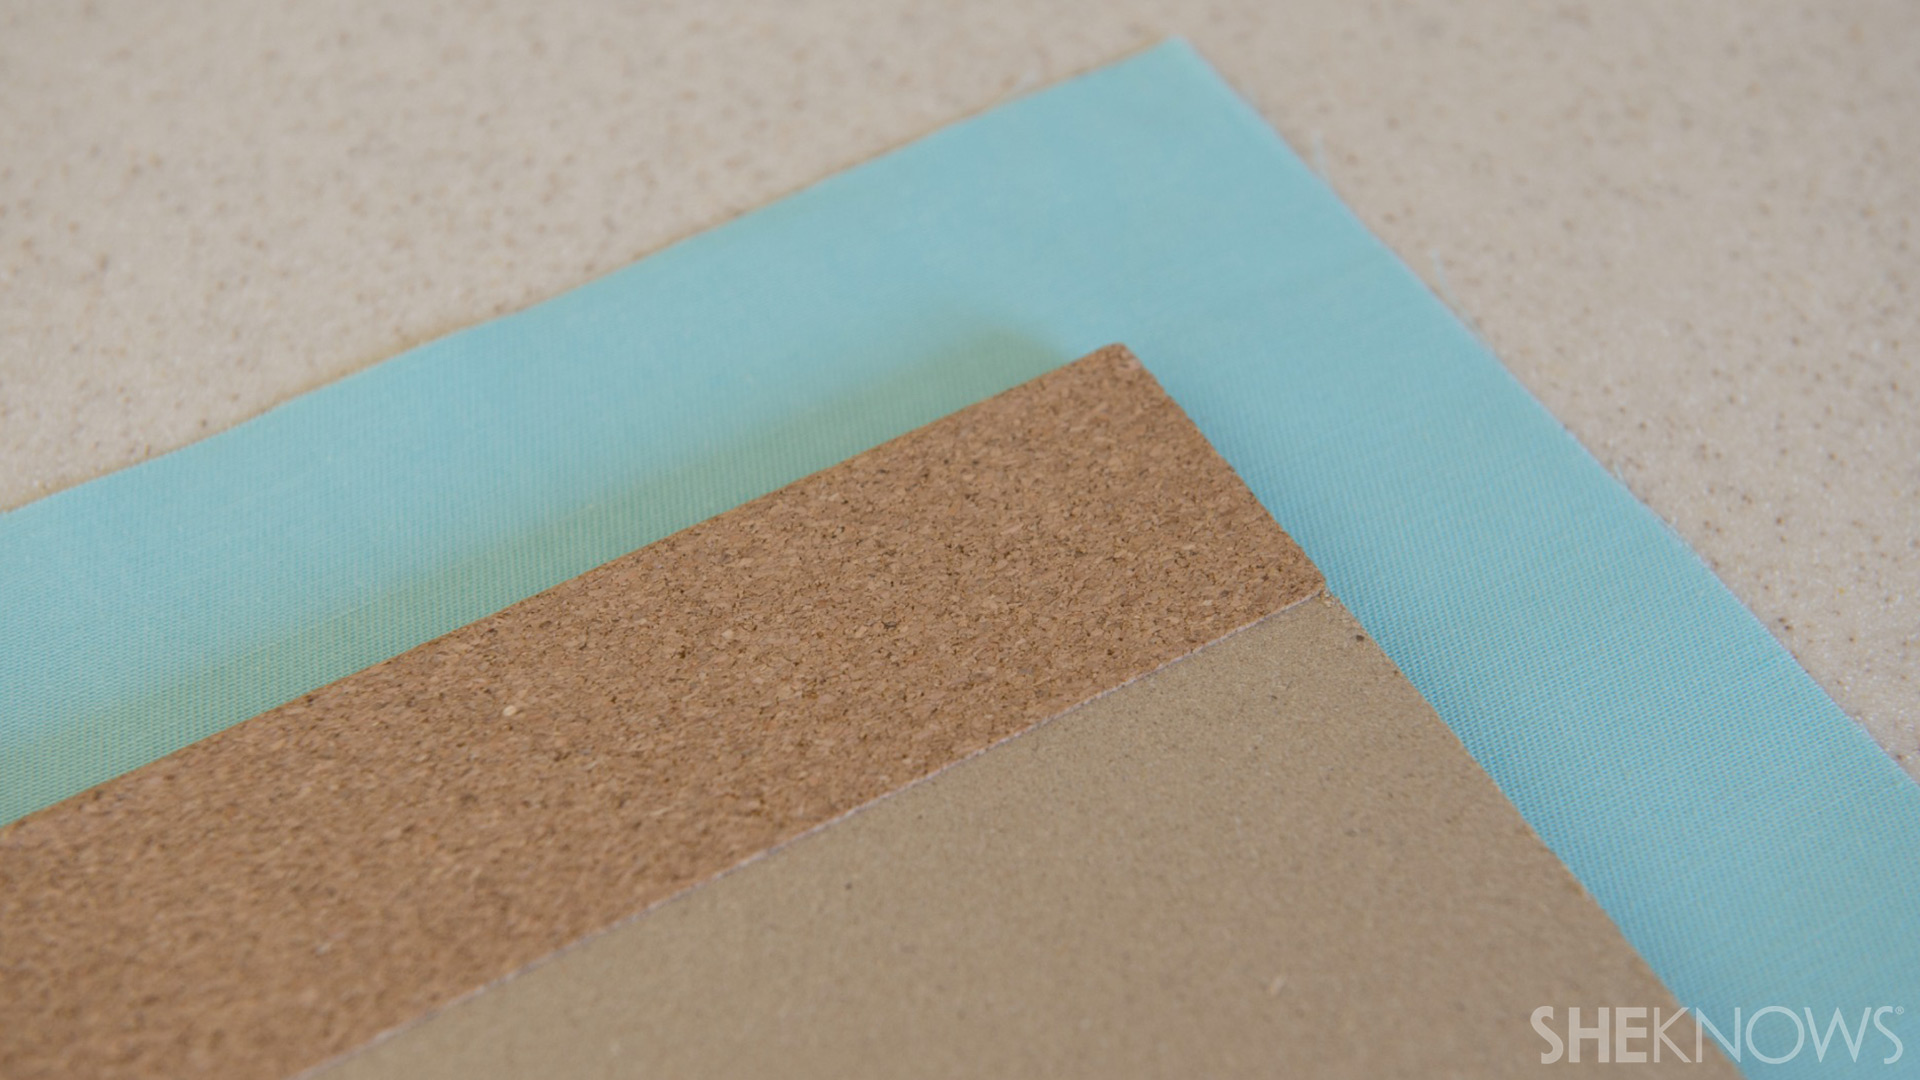 Back to school Bulletin board   Sheknows.com - place corkboard on fabric